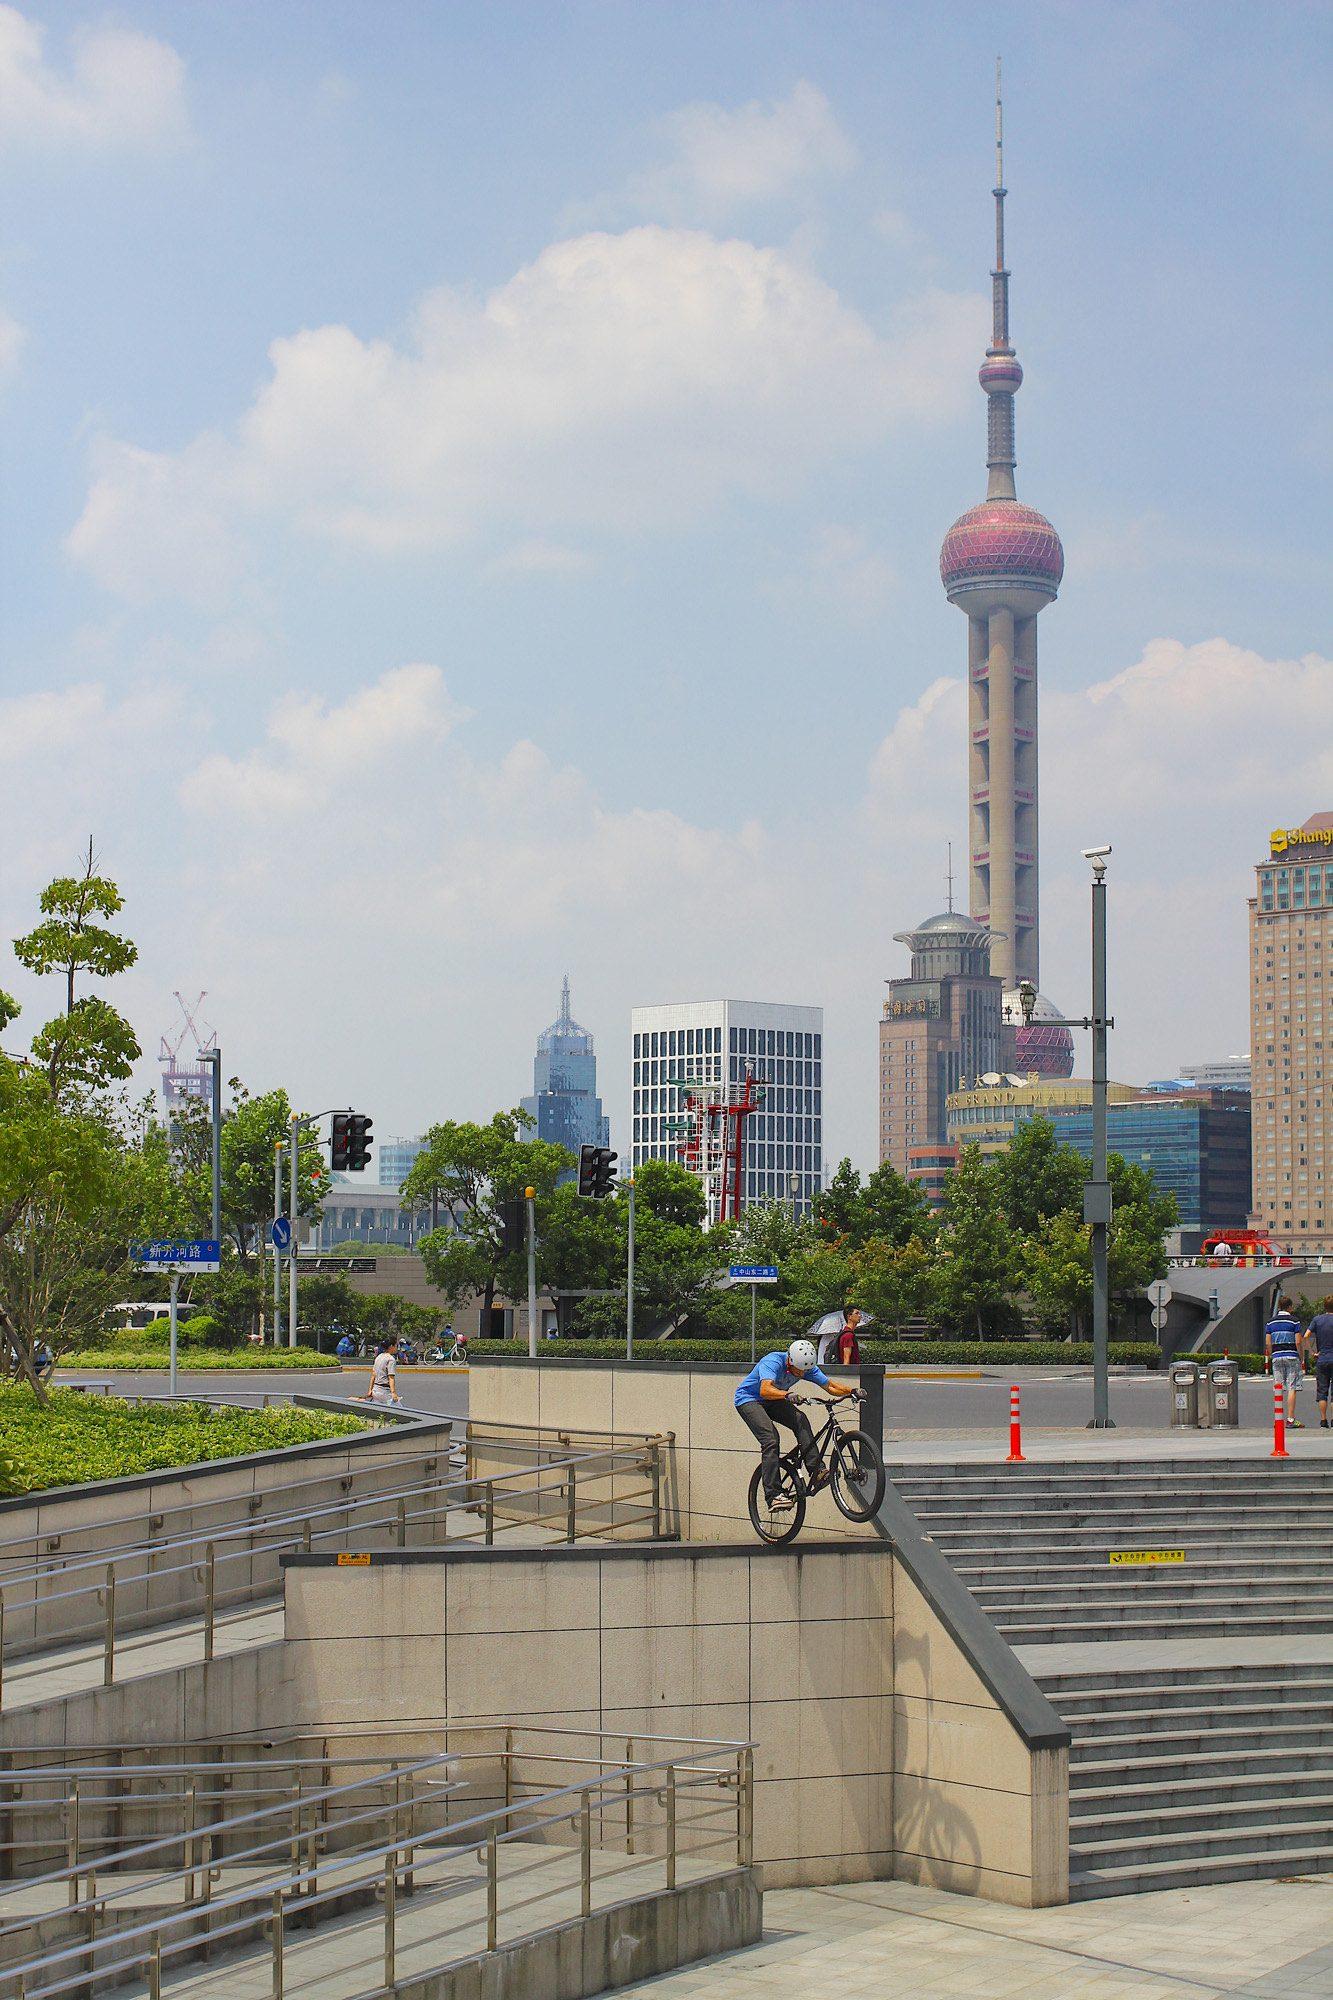 Dominik Raab in China